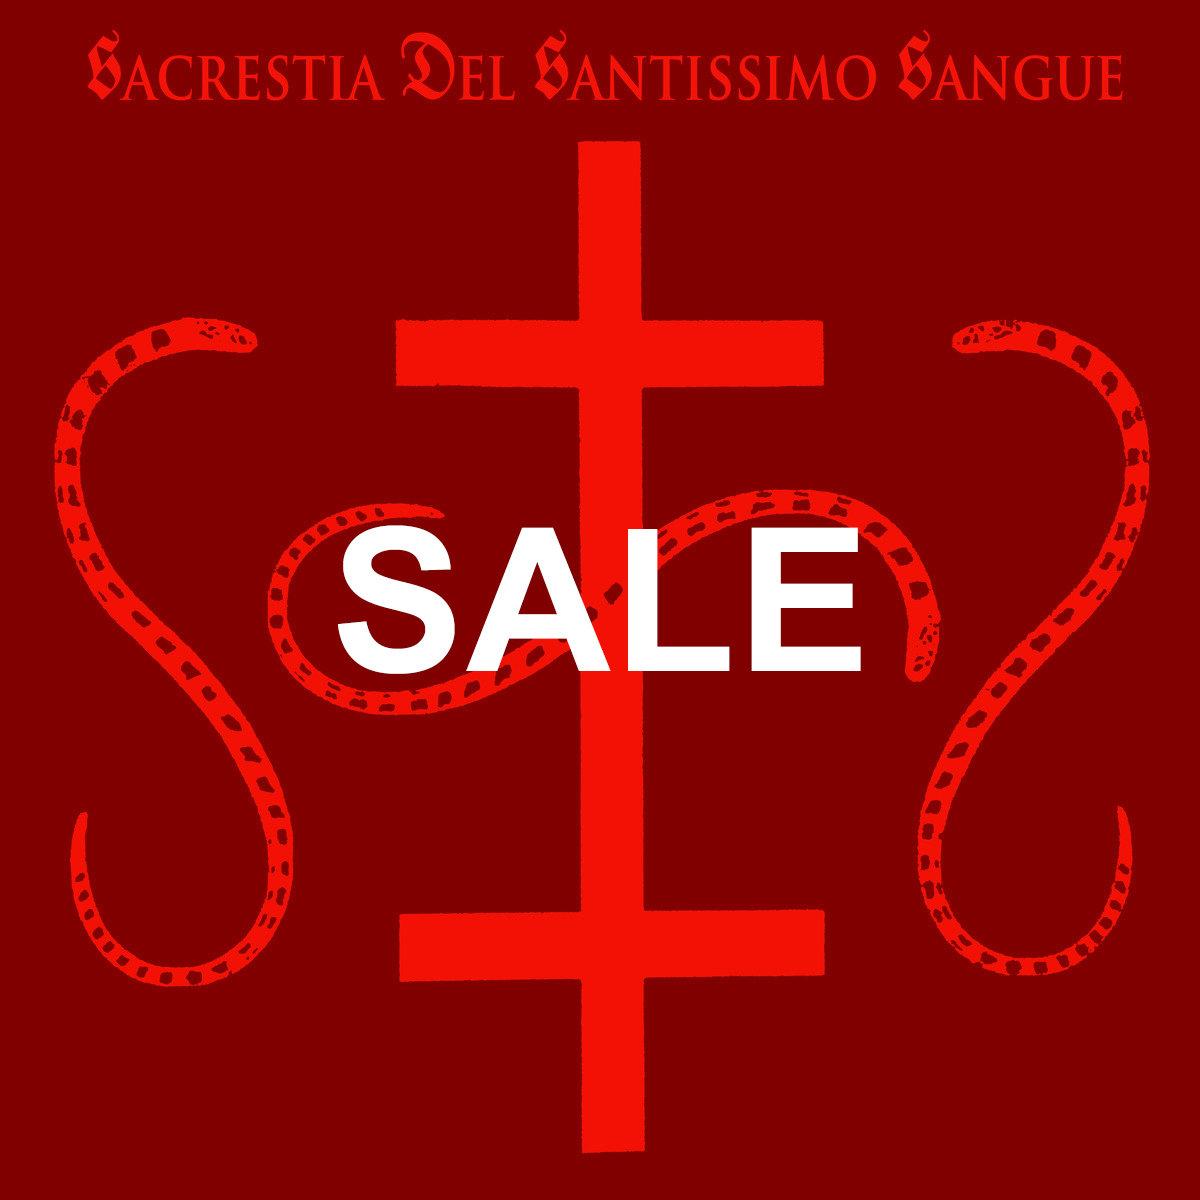 Sacrestia Del Santissimo Sangue - Real Italian Occult Terrorism